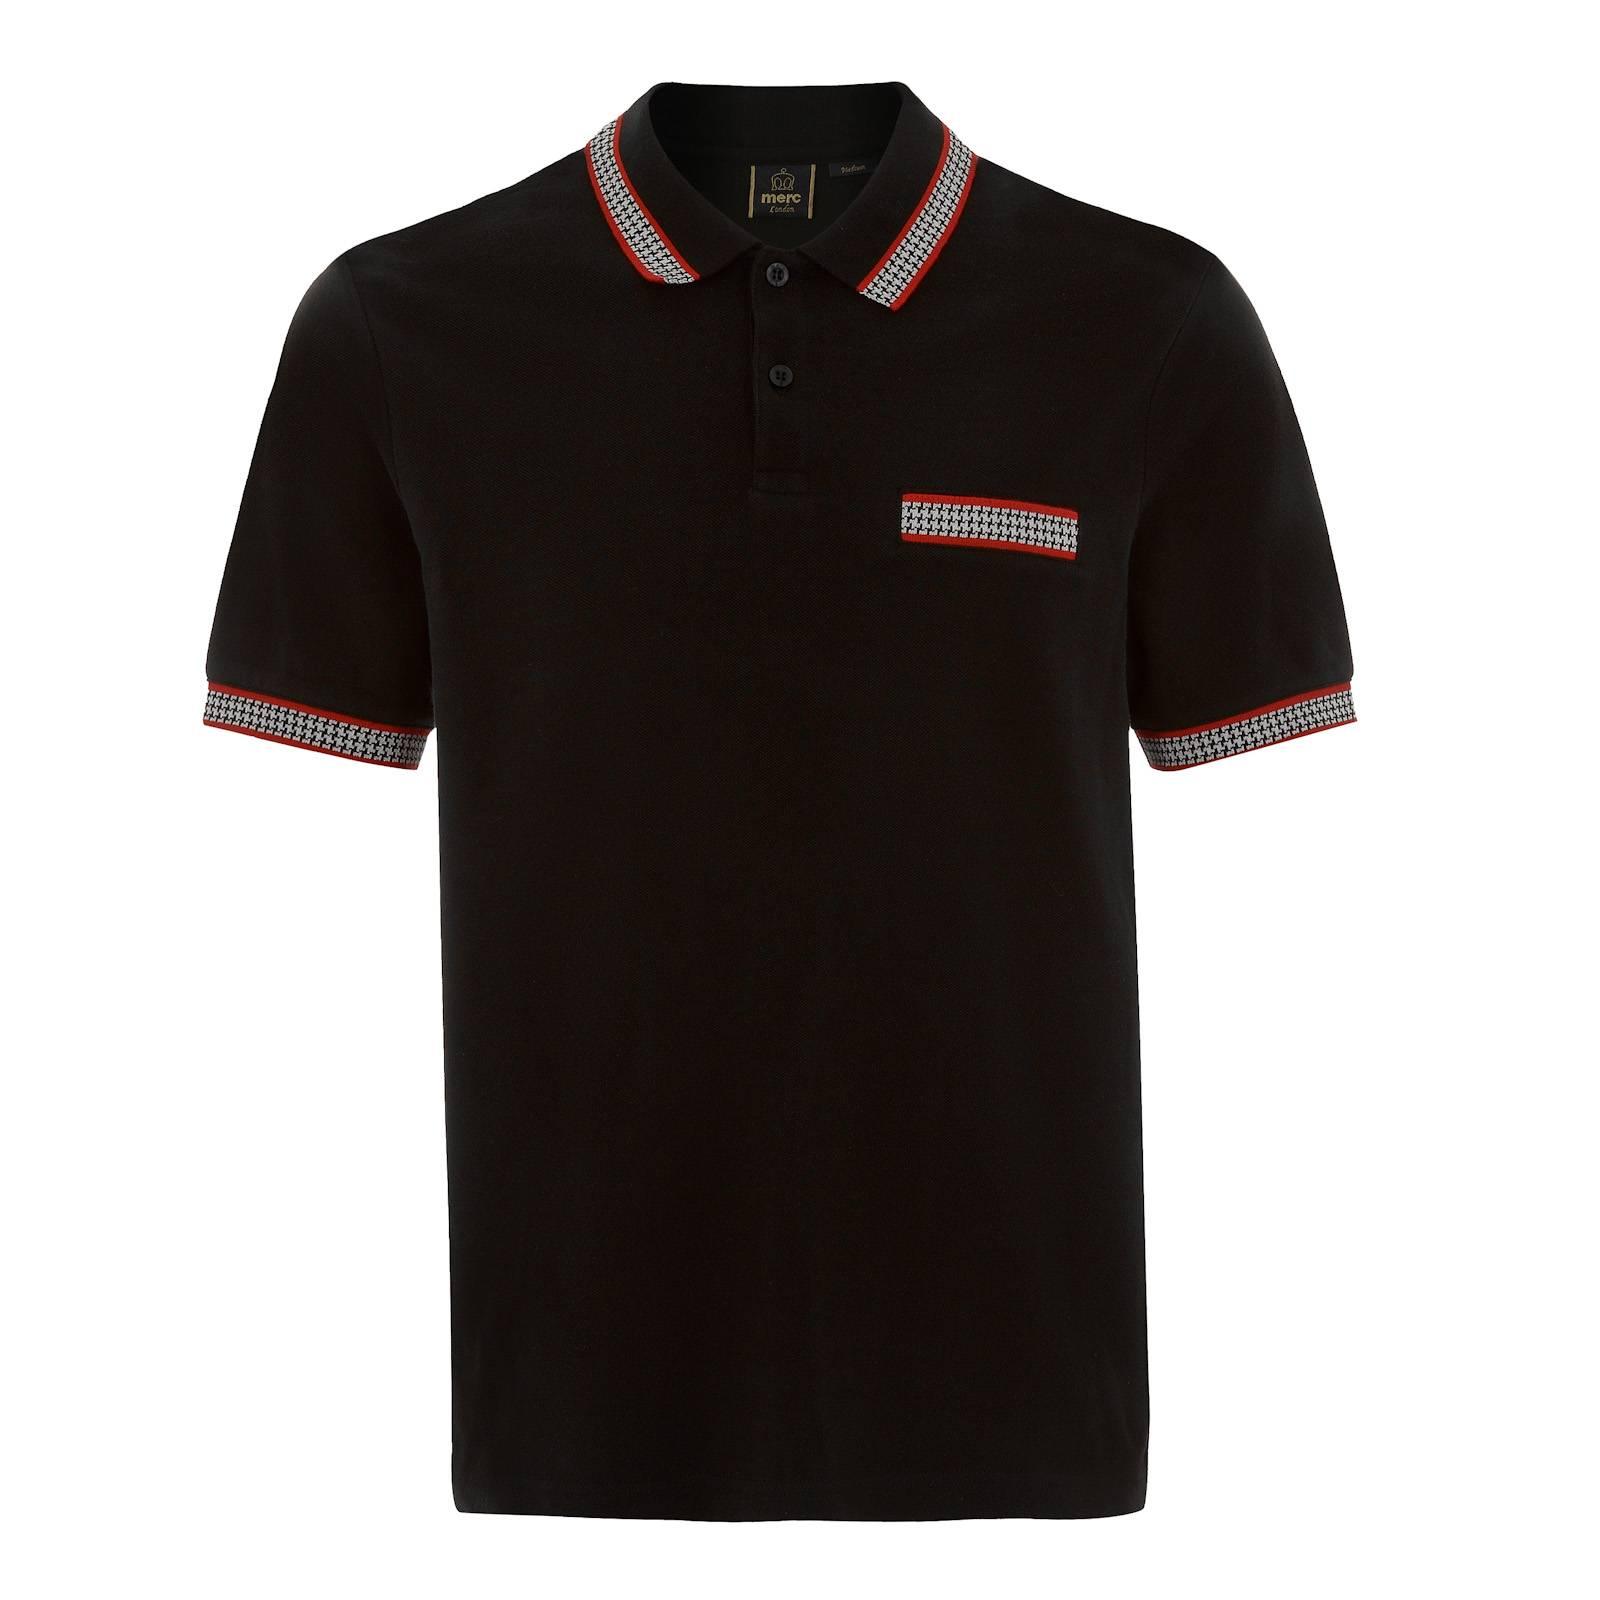 Рубашка Поло VenturaRude Boy by Merc<br><br><br>Артикул: 1915103<br>Материал: 100% хлопок<br>Цвет: черный<br>Пол: Мужской